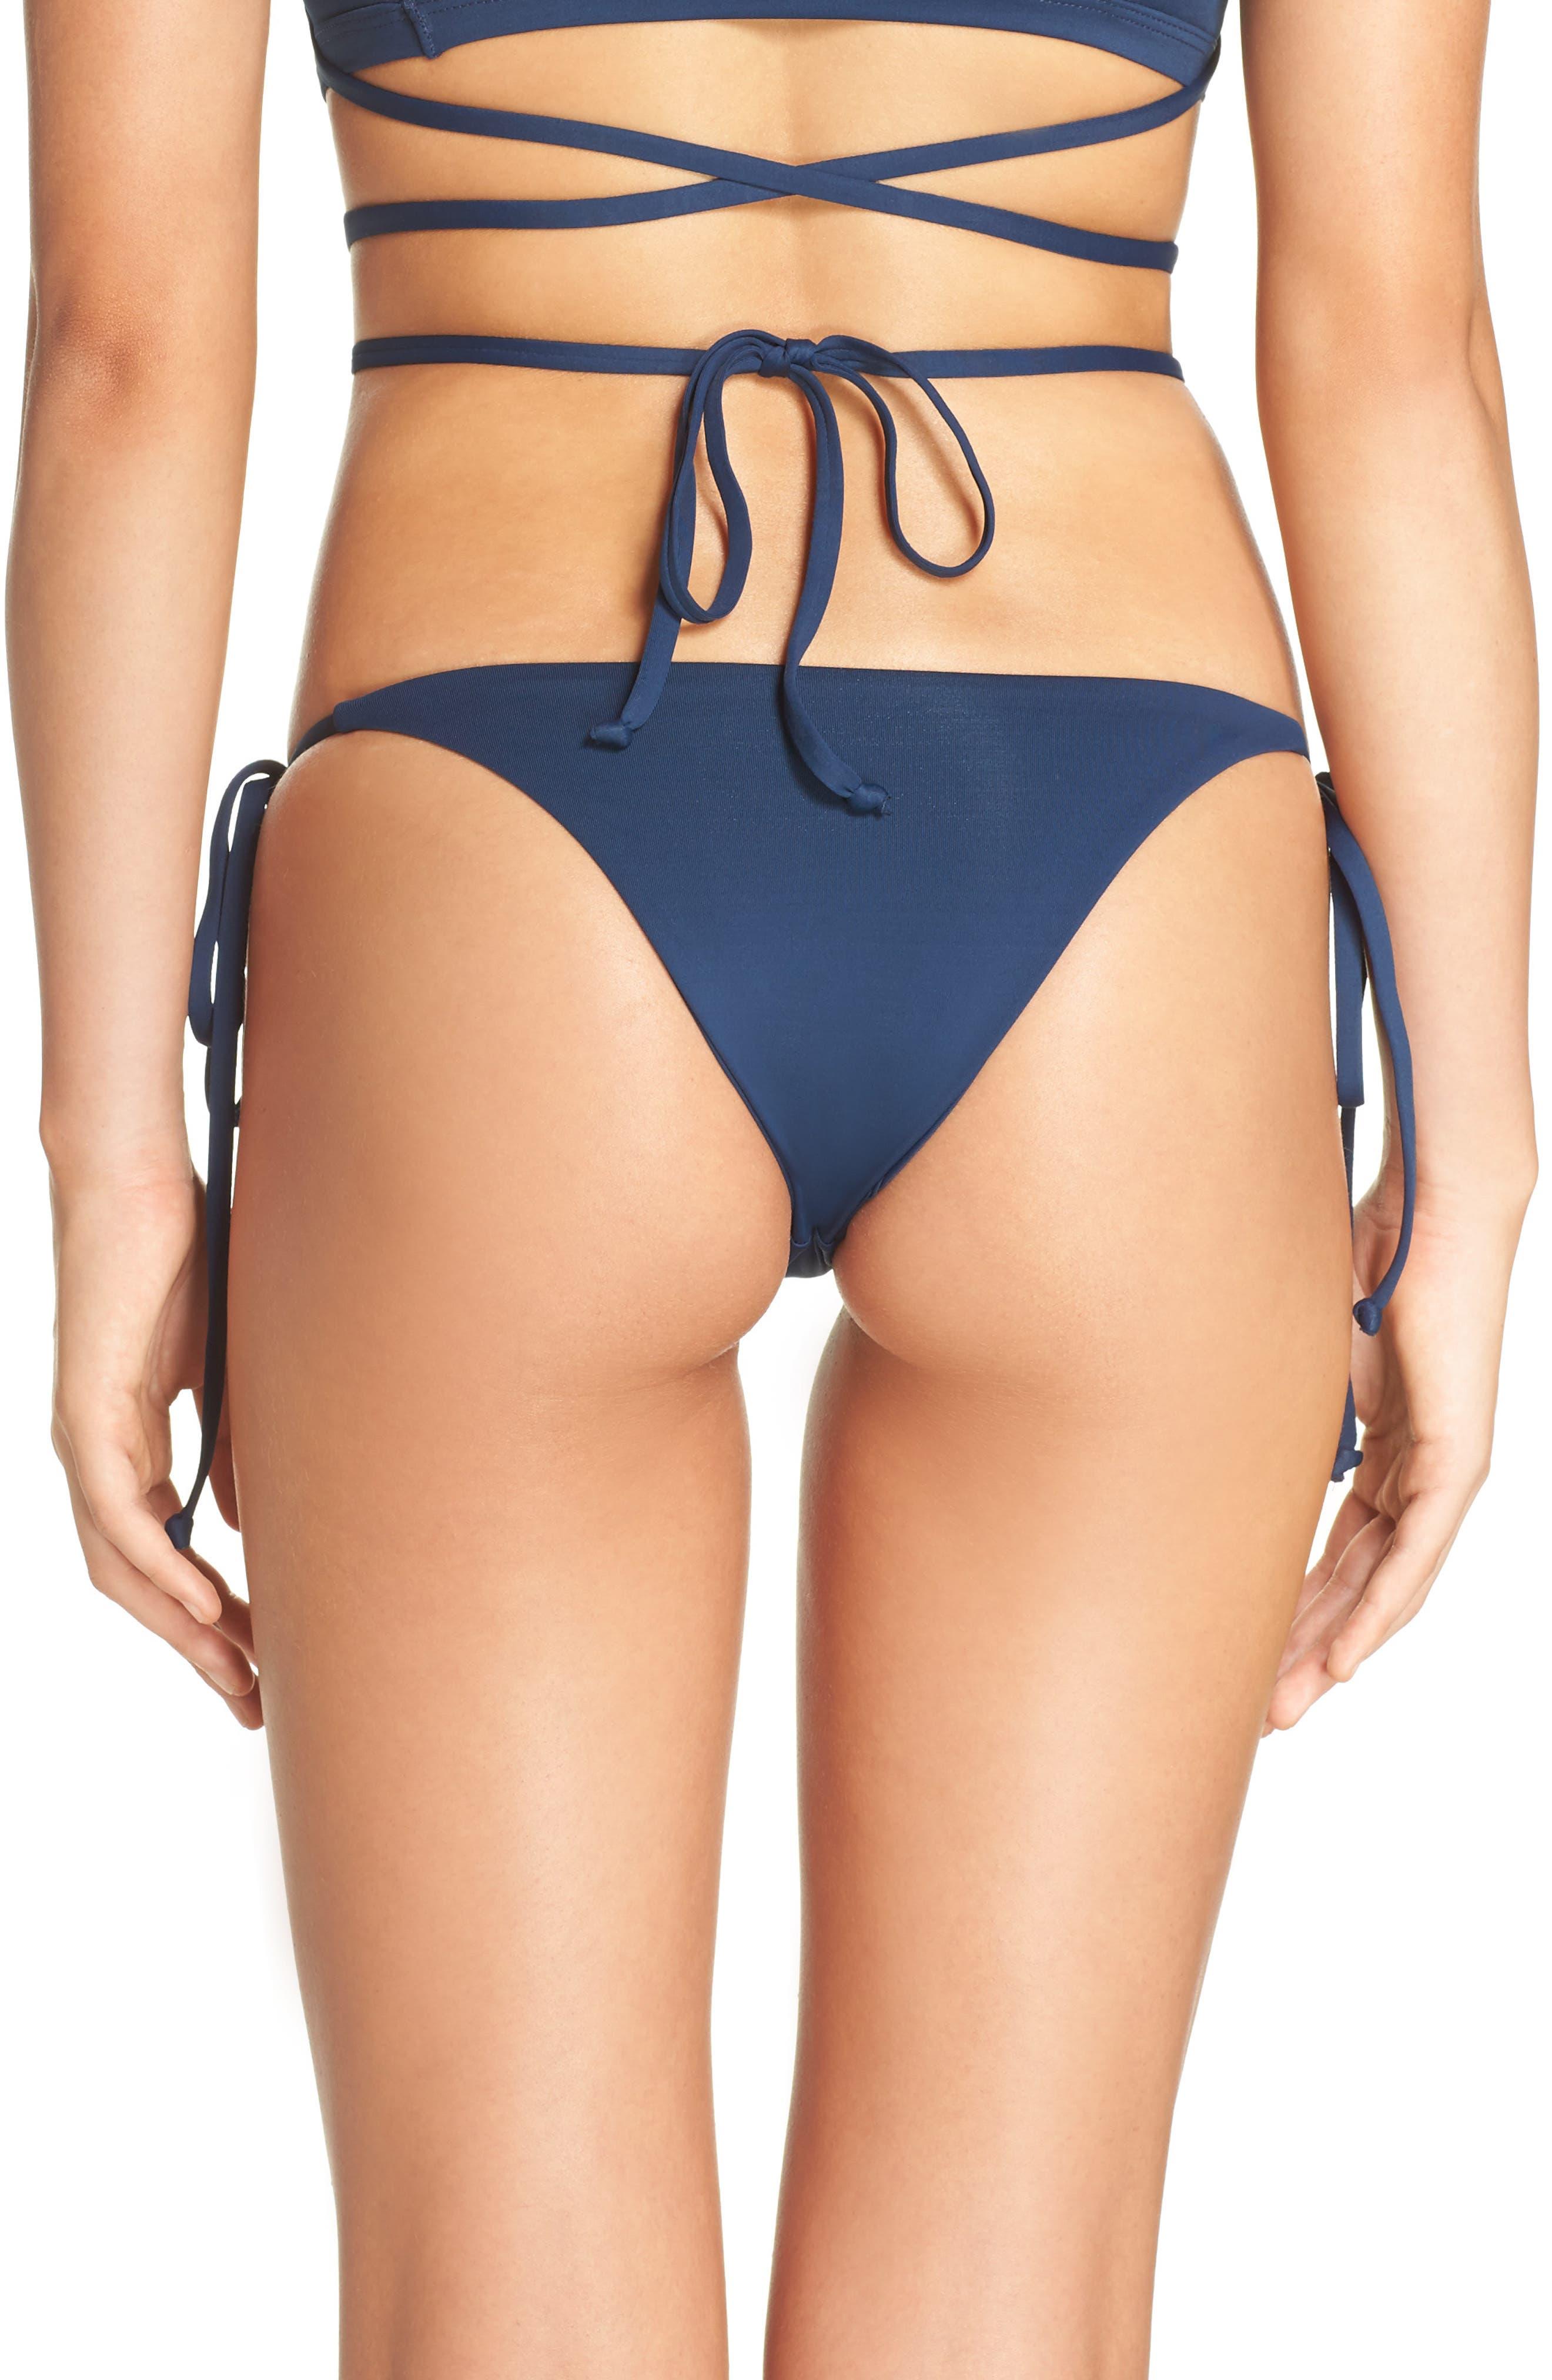 Frankies Bikinis Marley Side Tie Bottoms